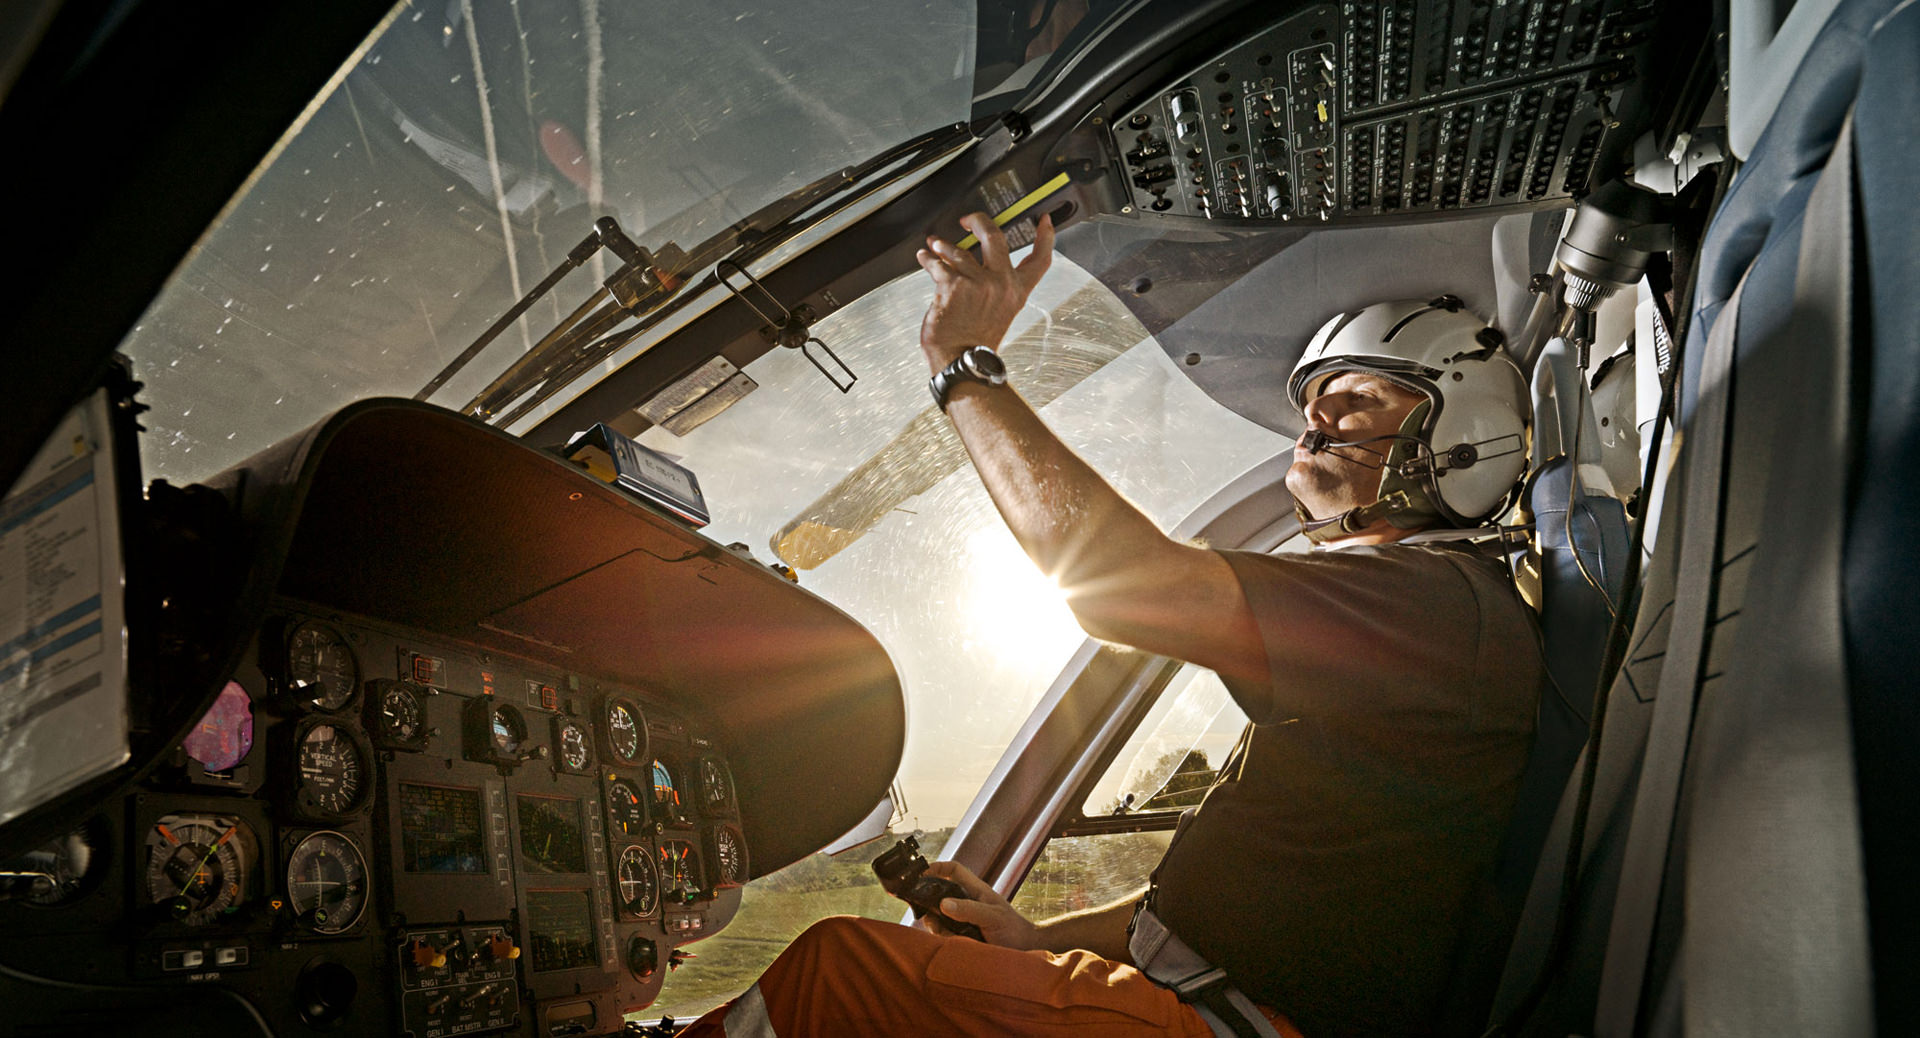 gelbe engel, adac, luftrettung, rescue, helicopter, Germany, anke luckmann, www.ankeluckmann.com, kai tietz, reportage, editorial, pilot